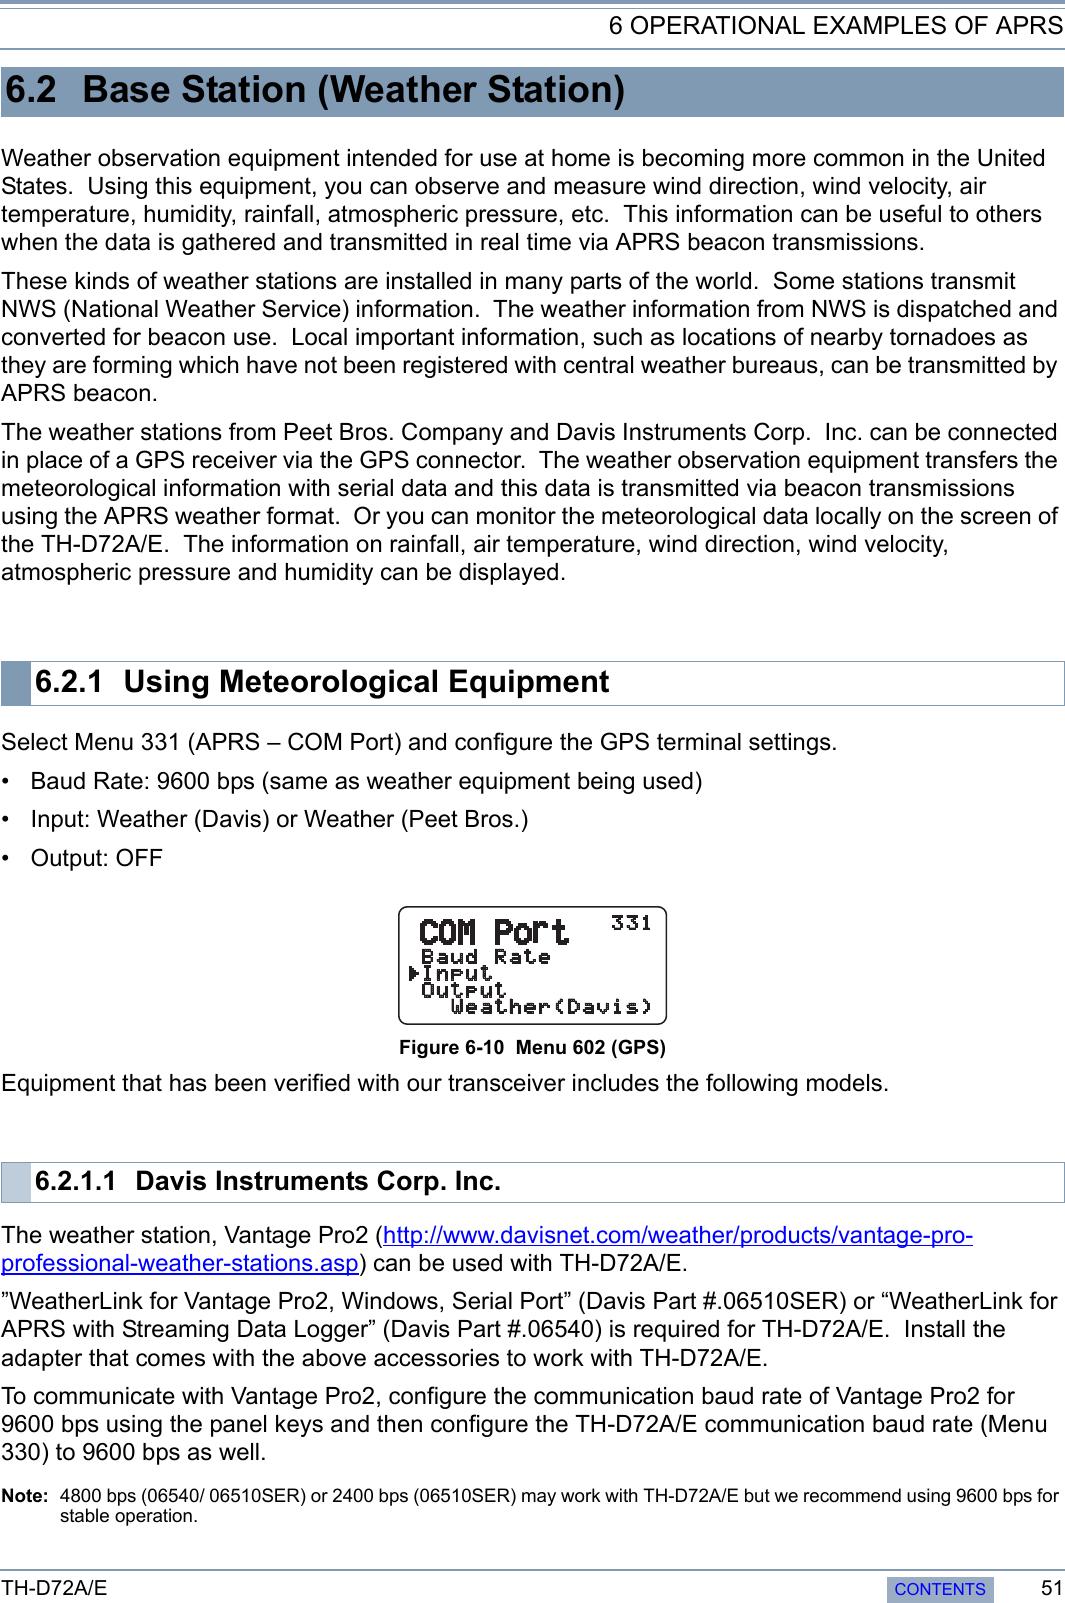 Kenwood Gps Receiver Th D72A E Users Manual D72AE_EN_20110515